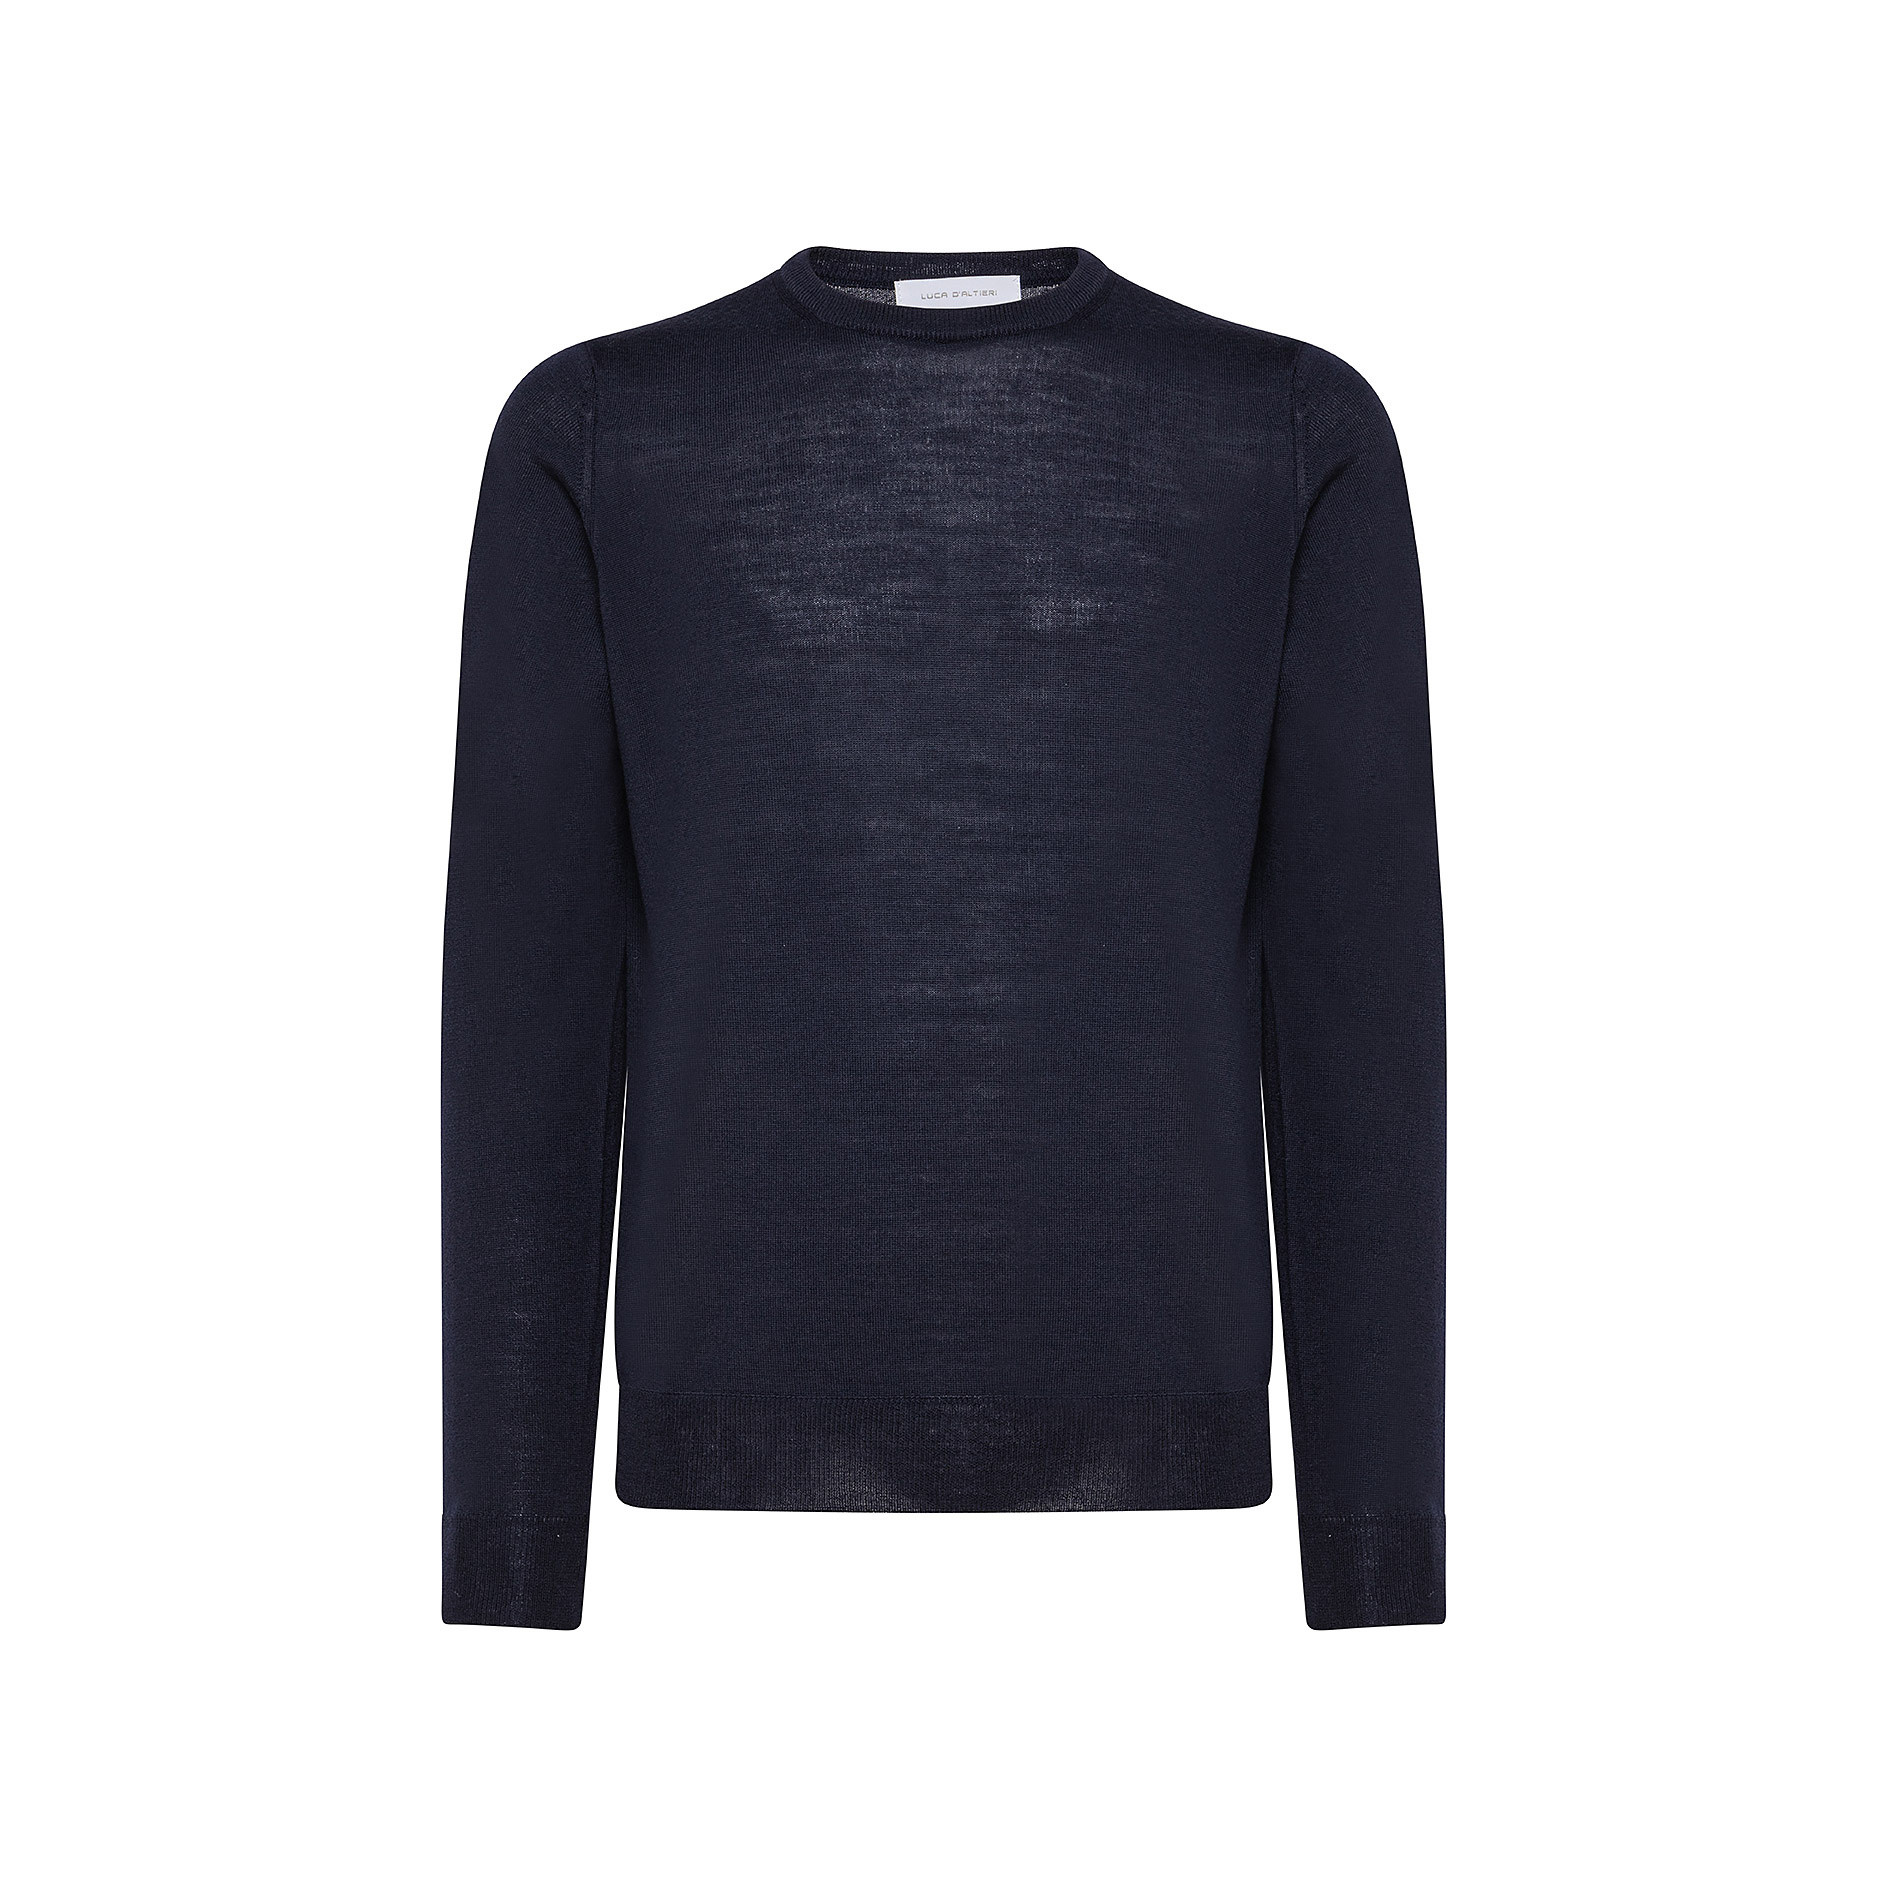 Pullover girocollo lana merinos extrafine, Blu, large image number 0